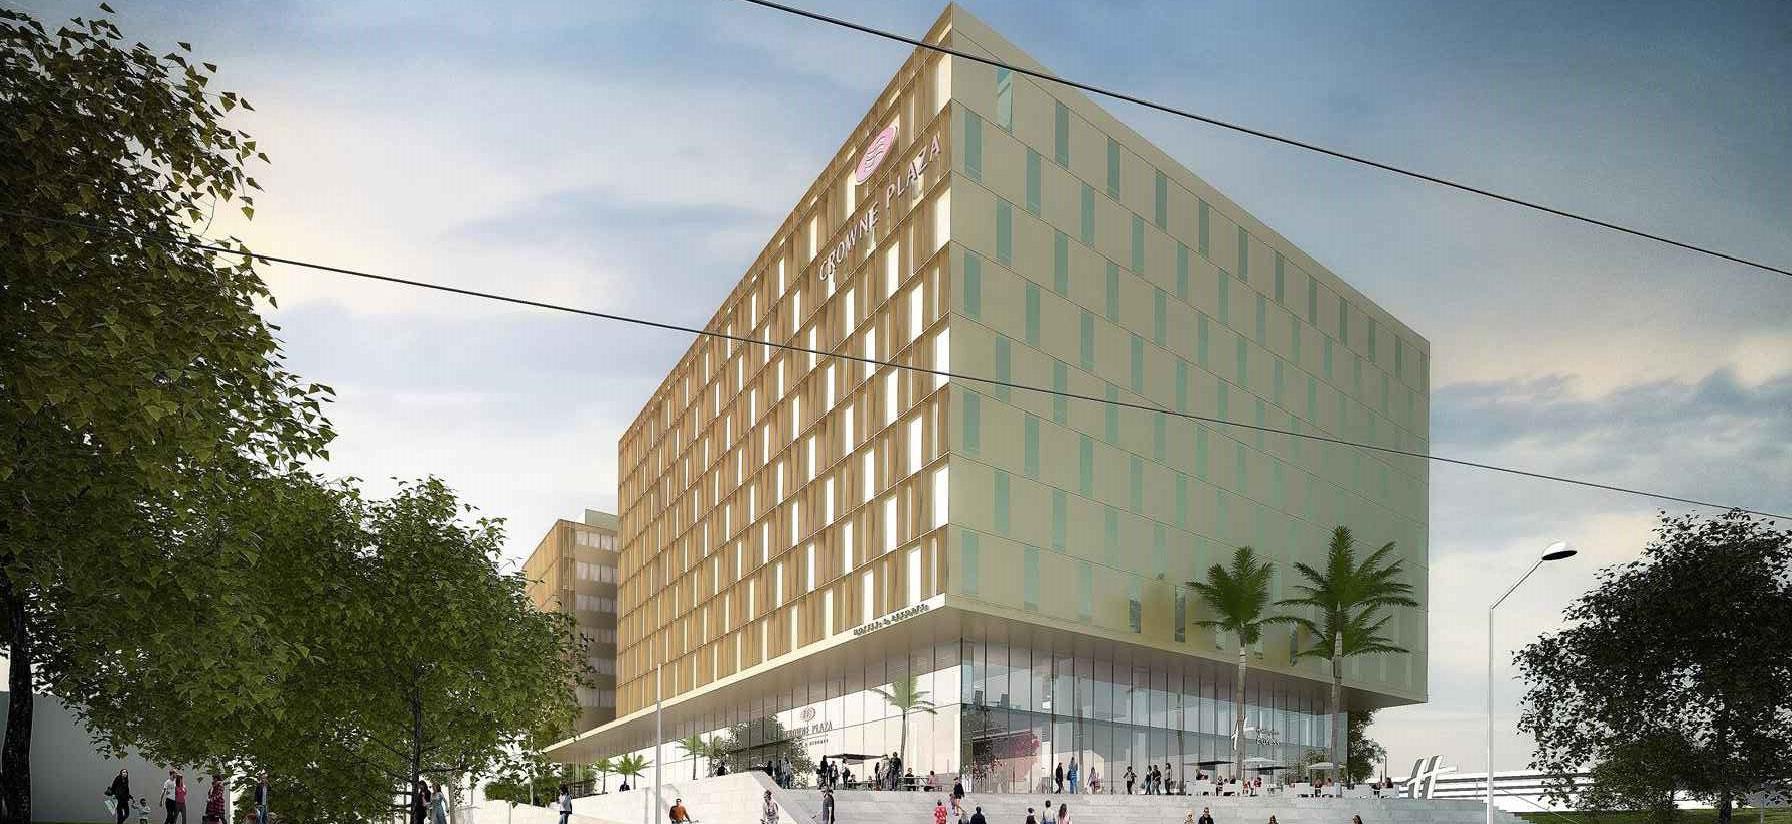 HPVA-Hotels-Projet-Nice-Grand-Arénas-coté-parvis-tram-galerie